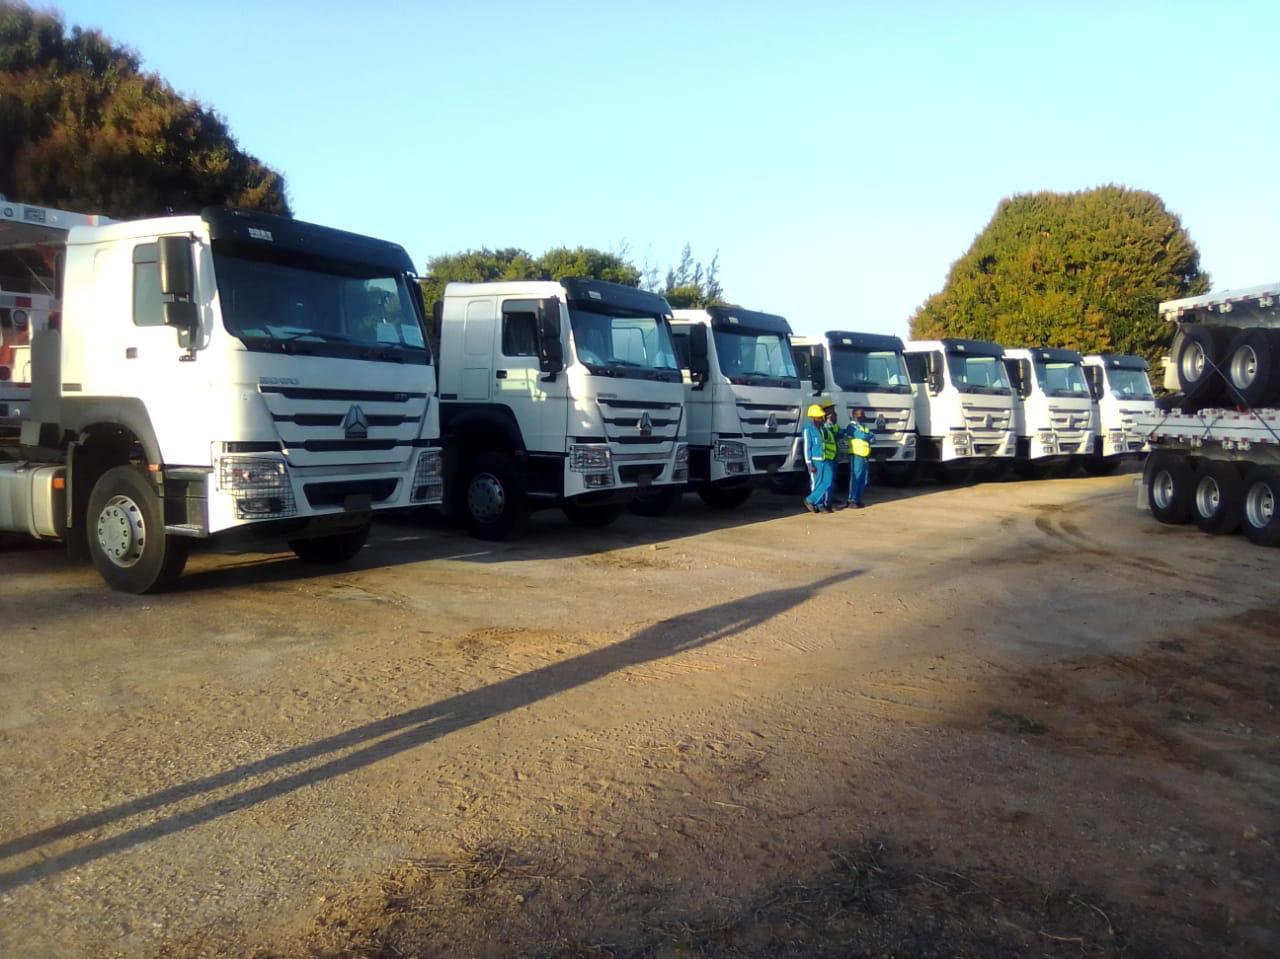 2021.08.03-AMTMZ-Truck_3